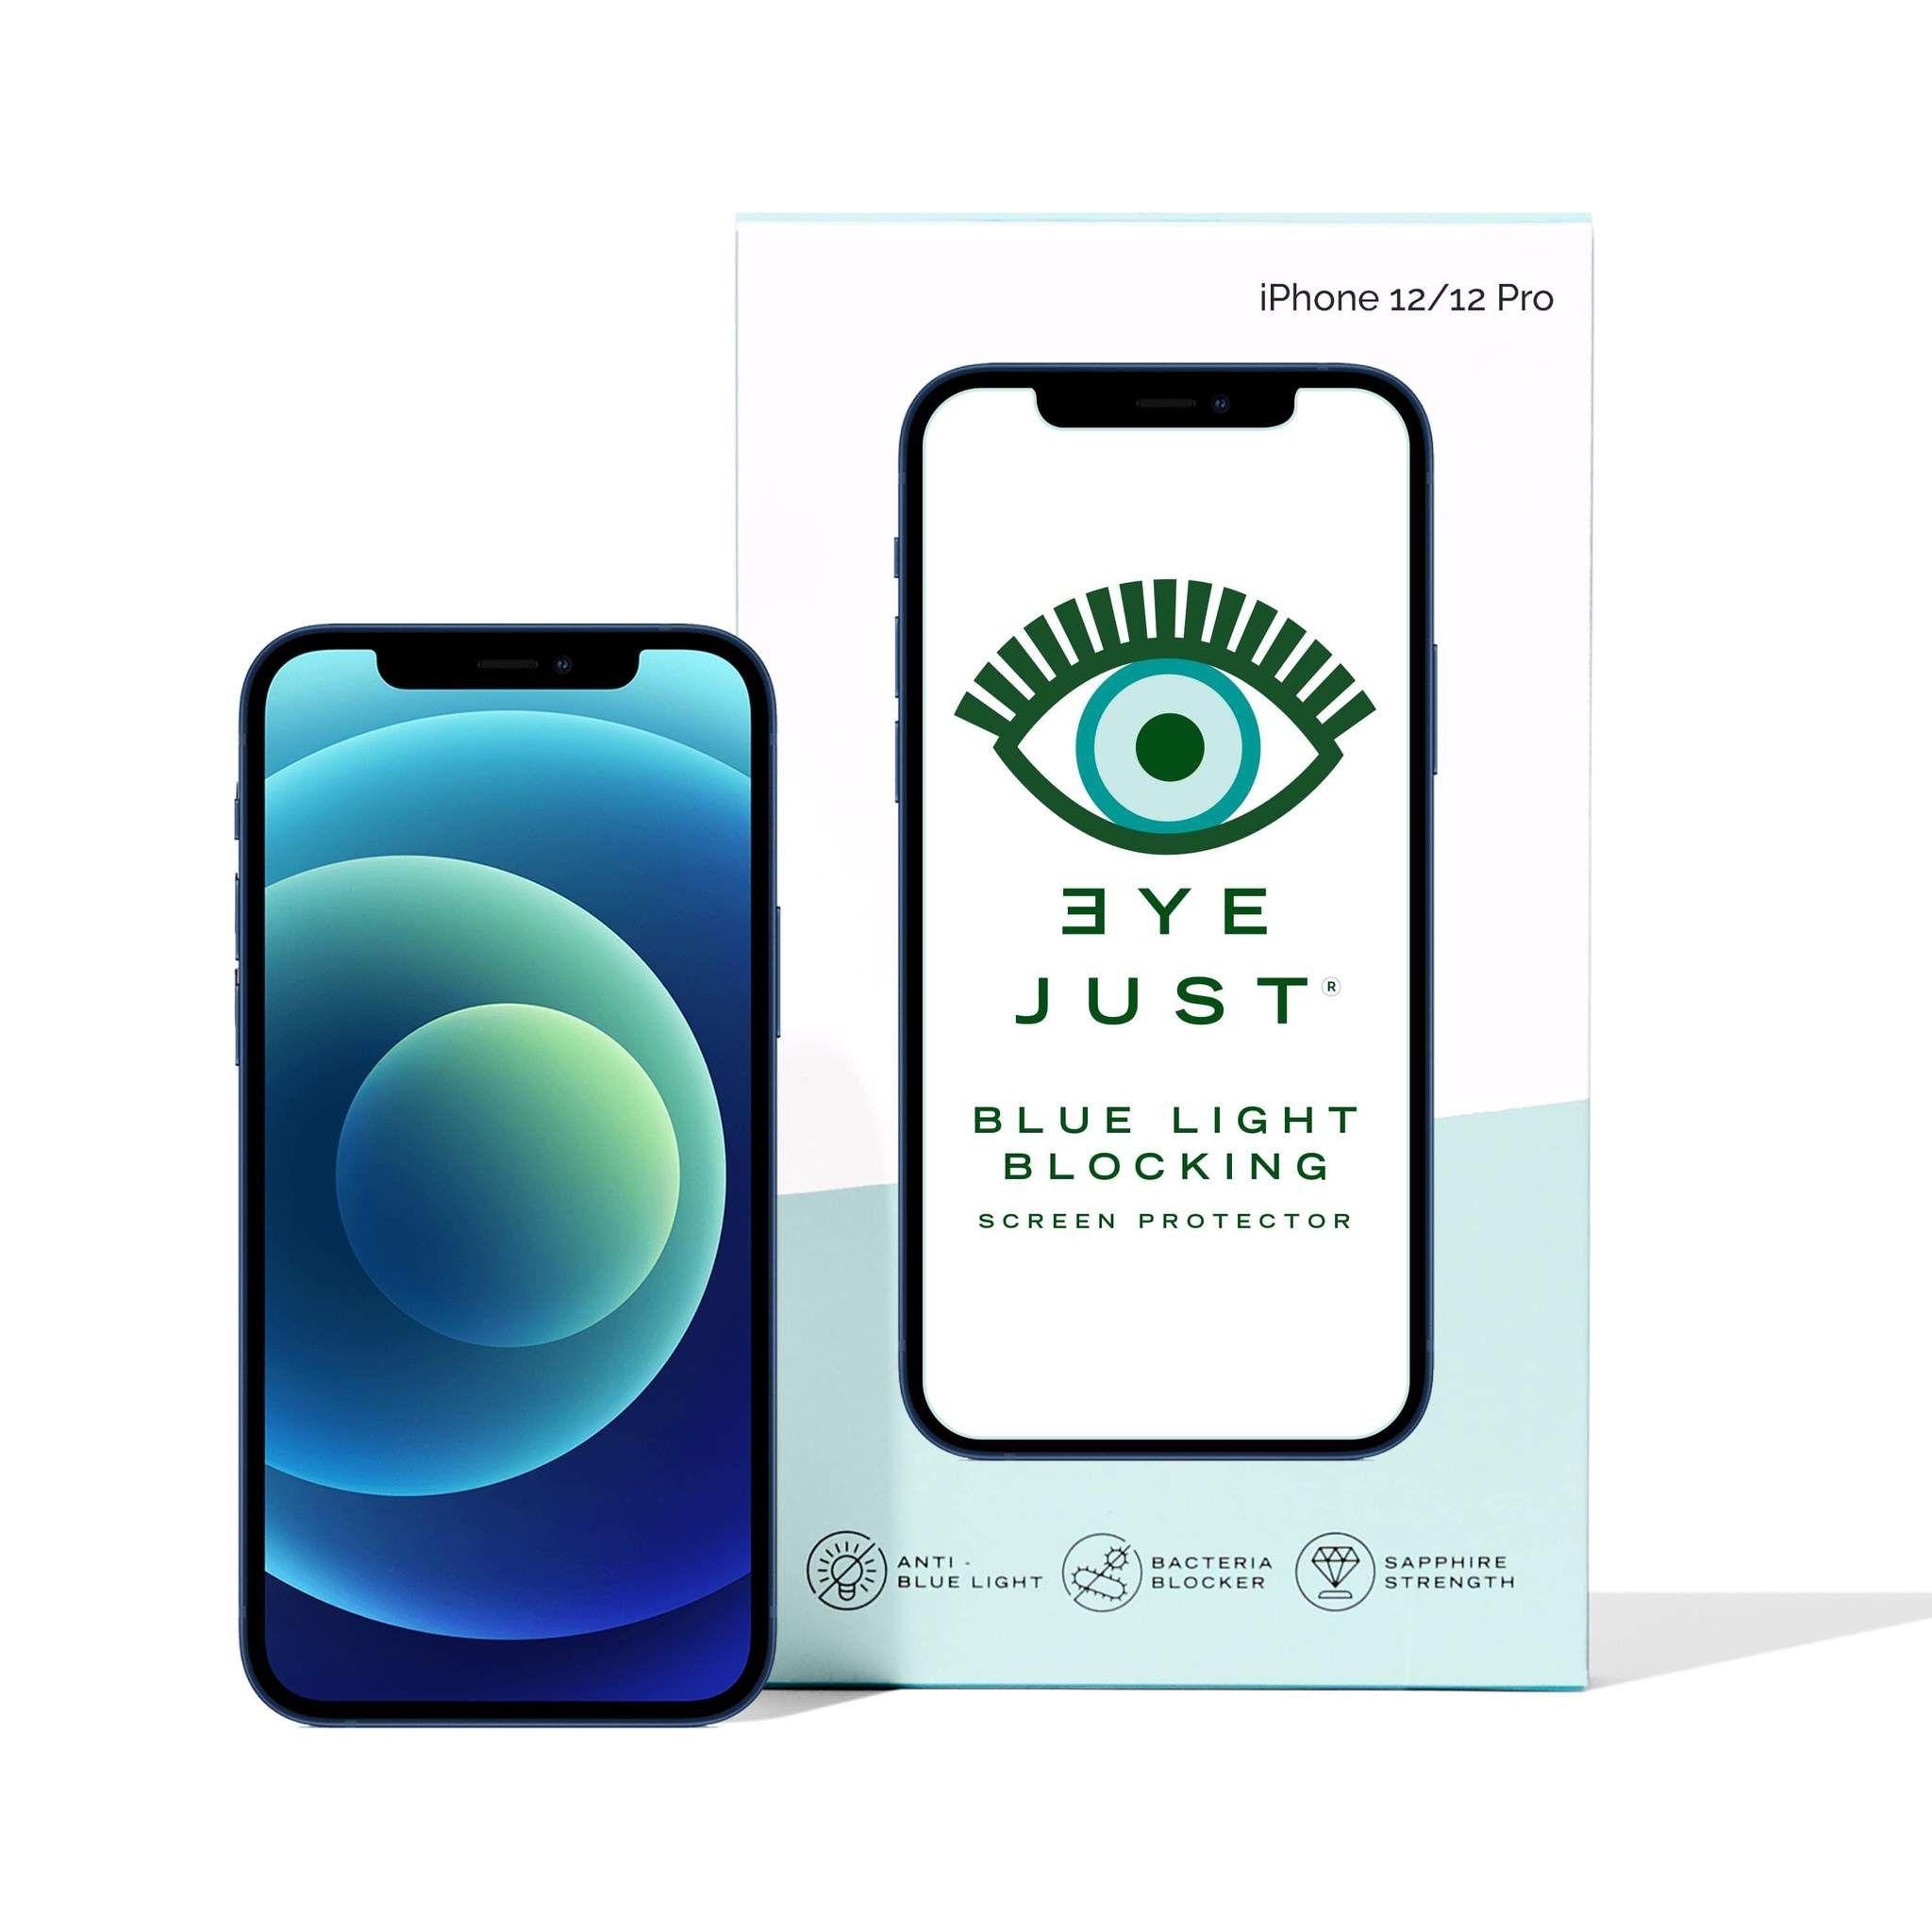 Eye Just Blue Light Blocking Screen Protector